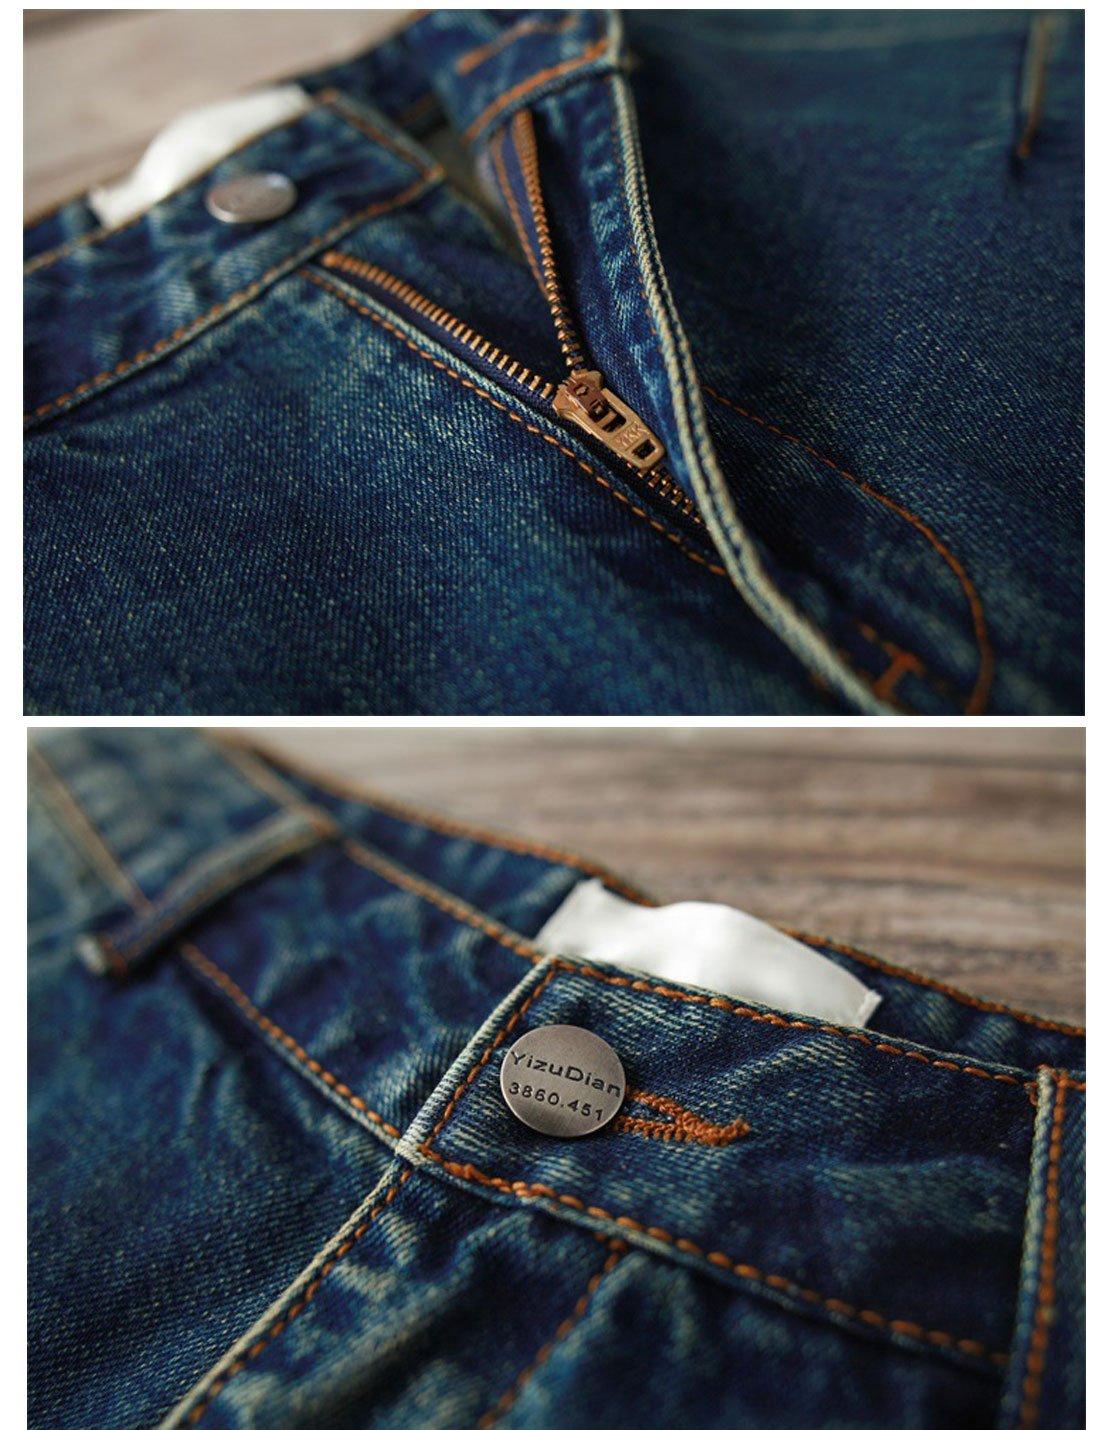 Yeokou Women's Casual Loose Distressed Baggy Harem Denim Jeans Cropped Pants (Large, Dark Blue) by Yeokou (Image #6)